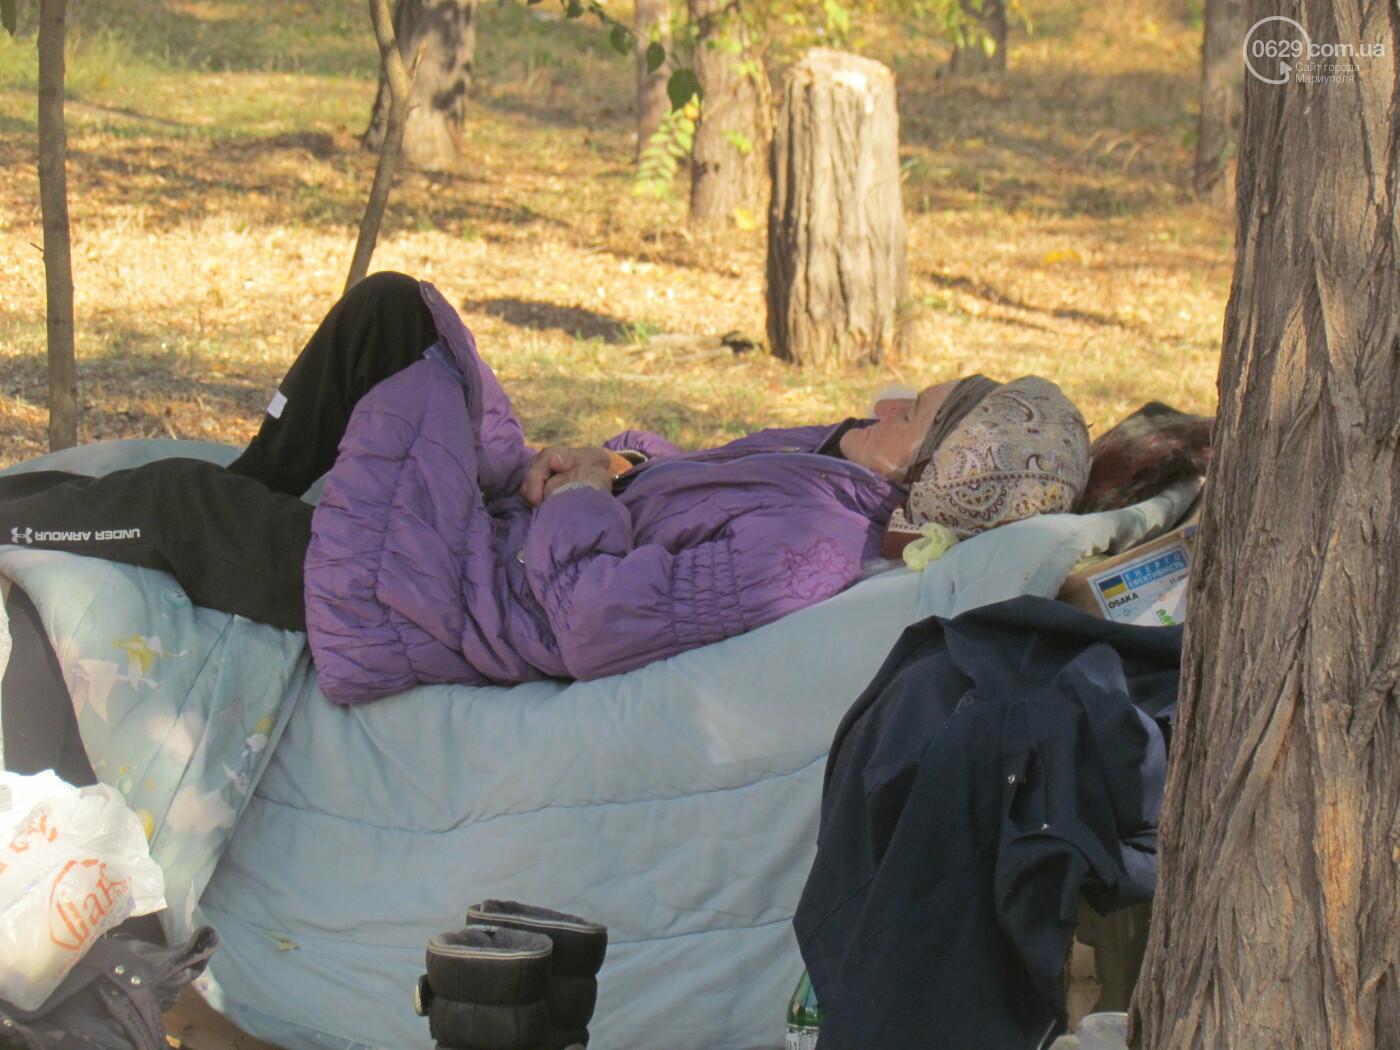 """Баба Роза"". Как жительница Киргизстана оказалась без дома и родни в Мариуполе, - ФОТО, фото-2"